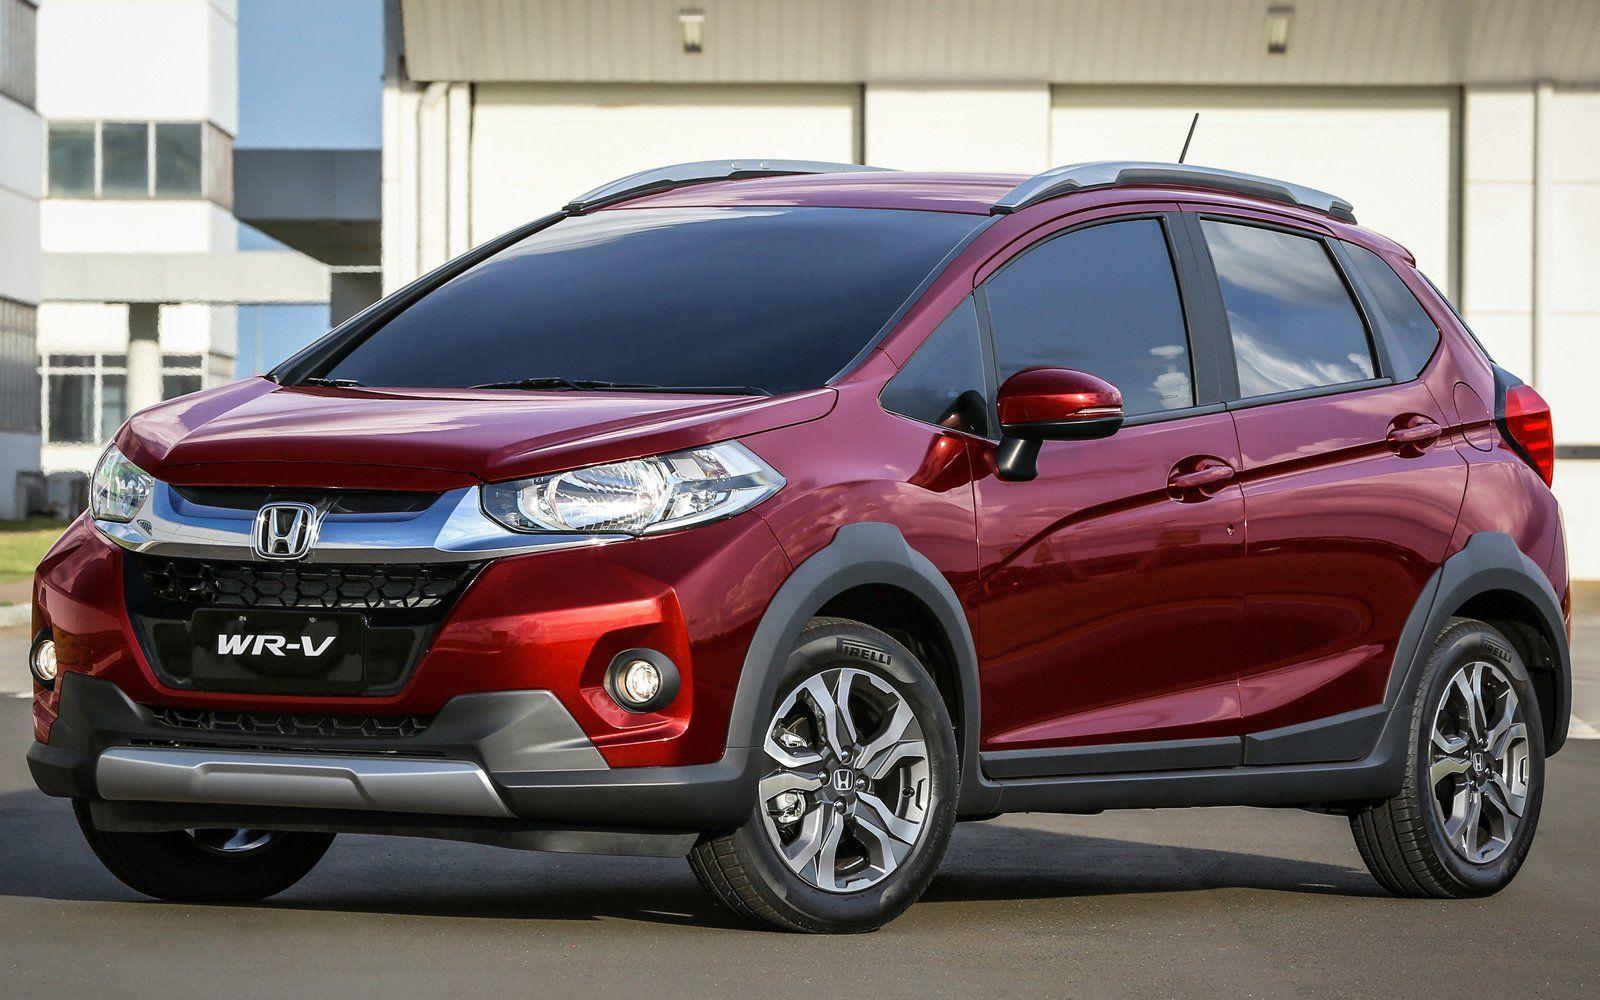 Honda Wrv 2020 Rumors From Honda Wr V 2019 2019 Honda Wrv Review Changes Engine 2019 2020 Suv With Regard To Honda Wrv 2020 Upcoming Cars Honda New Cars